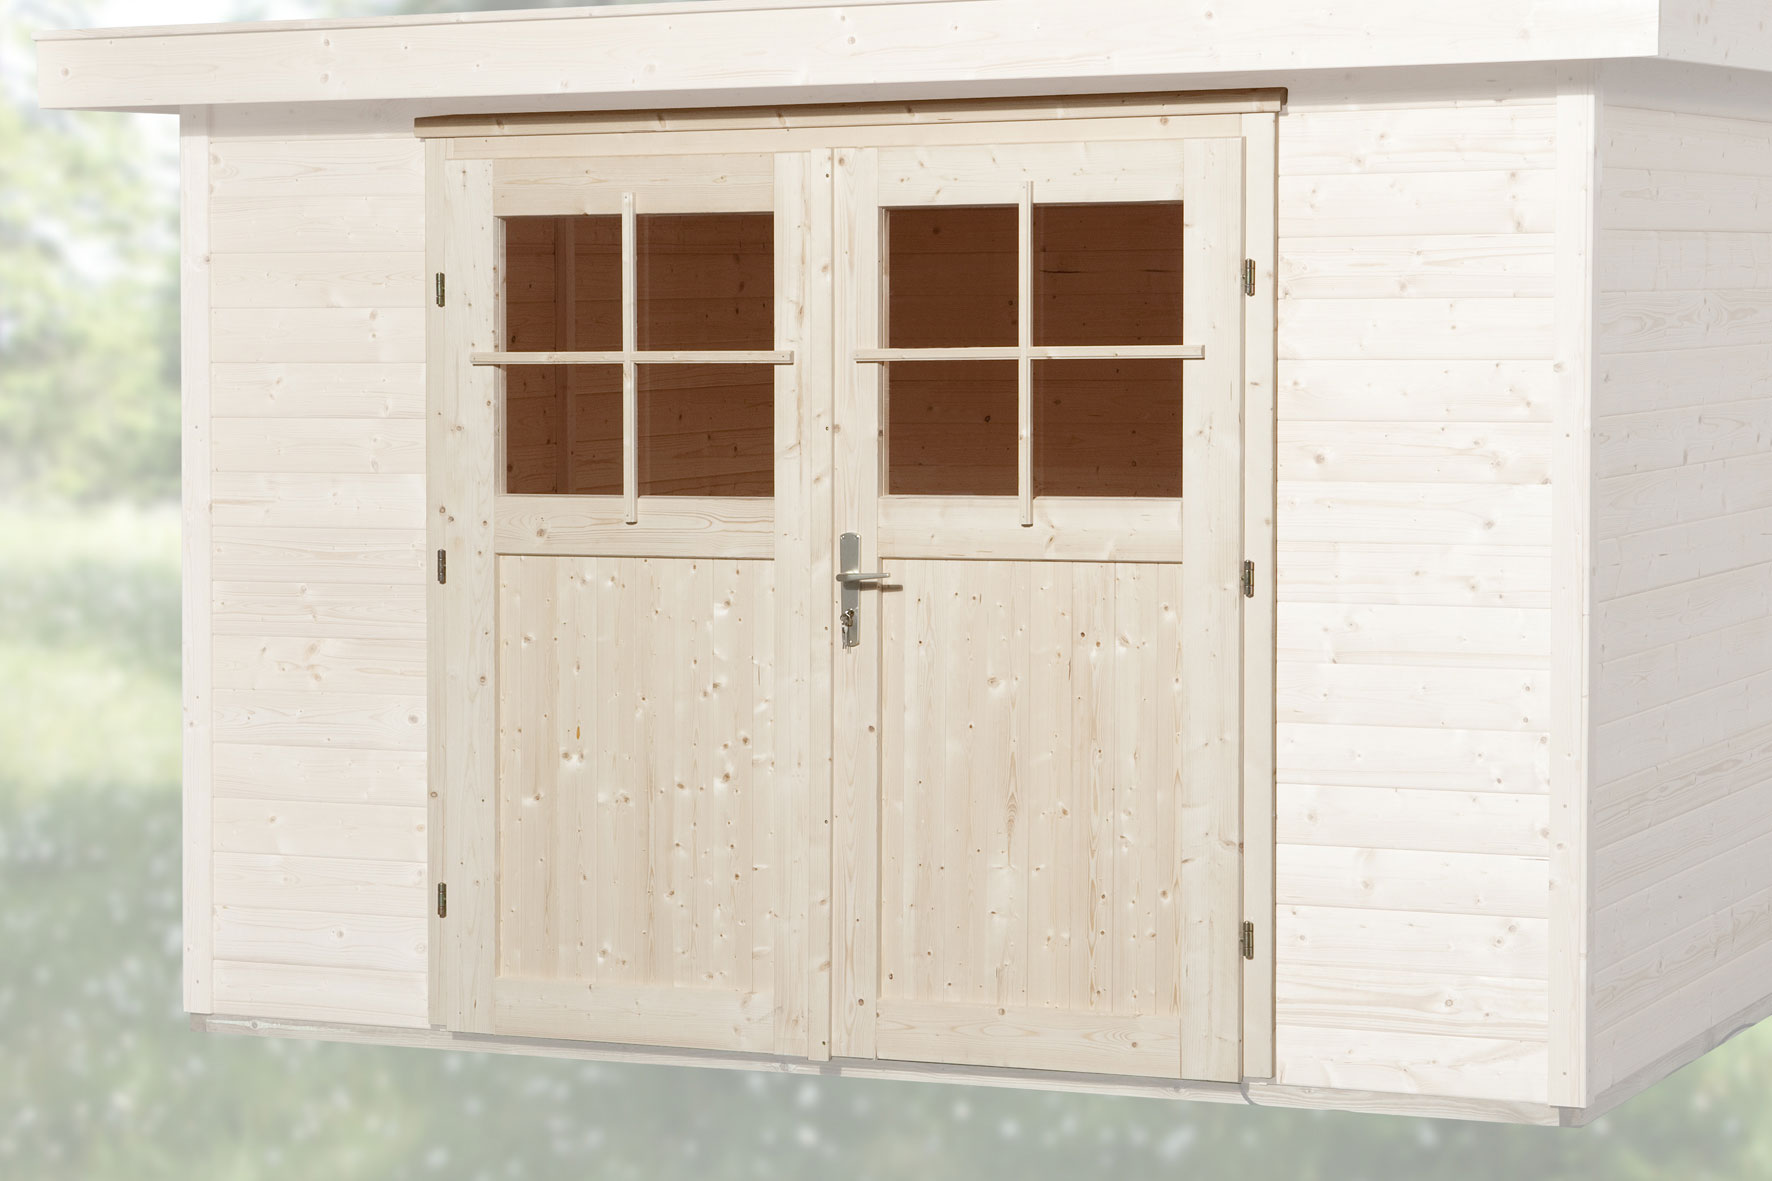 Gartenhaustür für Wandstärke 21 - 28 mm 182x183cm Bild 1